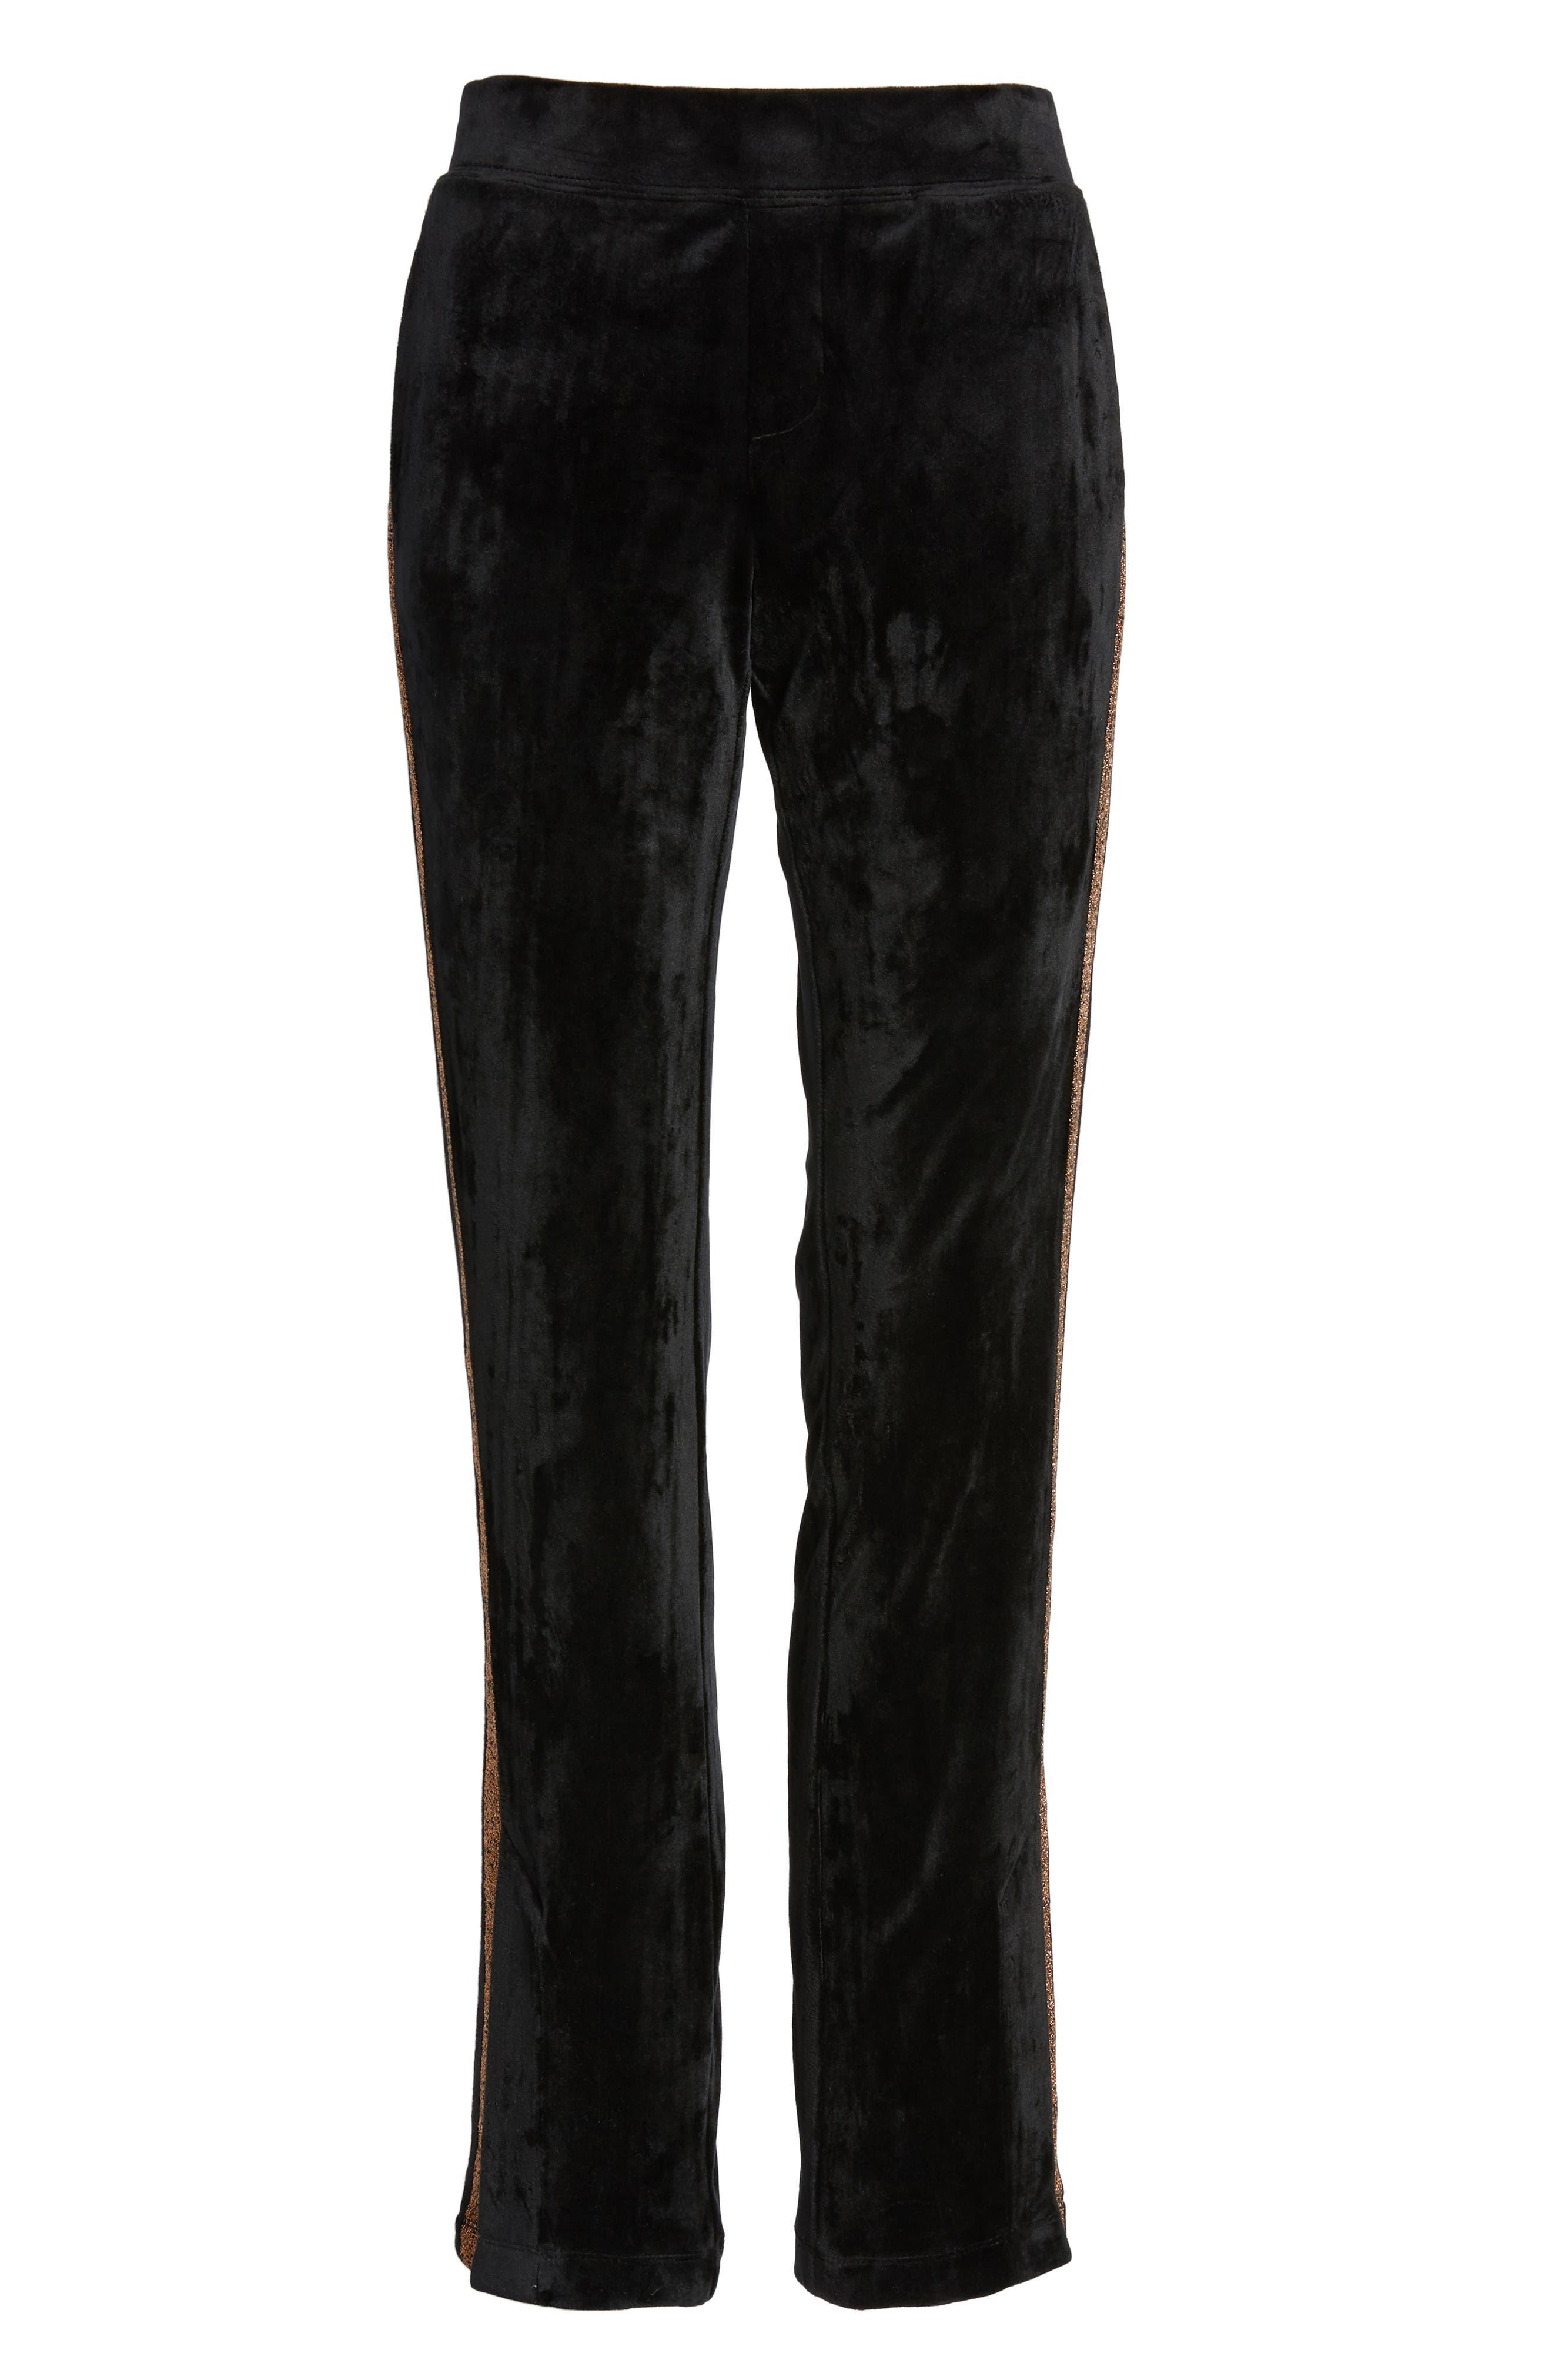 Shimmer Stripe Track Pants,                             Alternate thumbnail 7, color,                             001